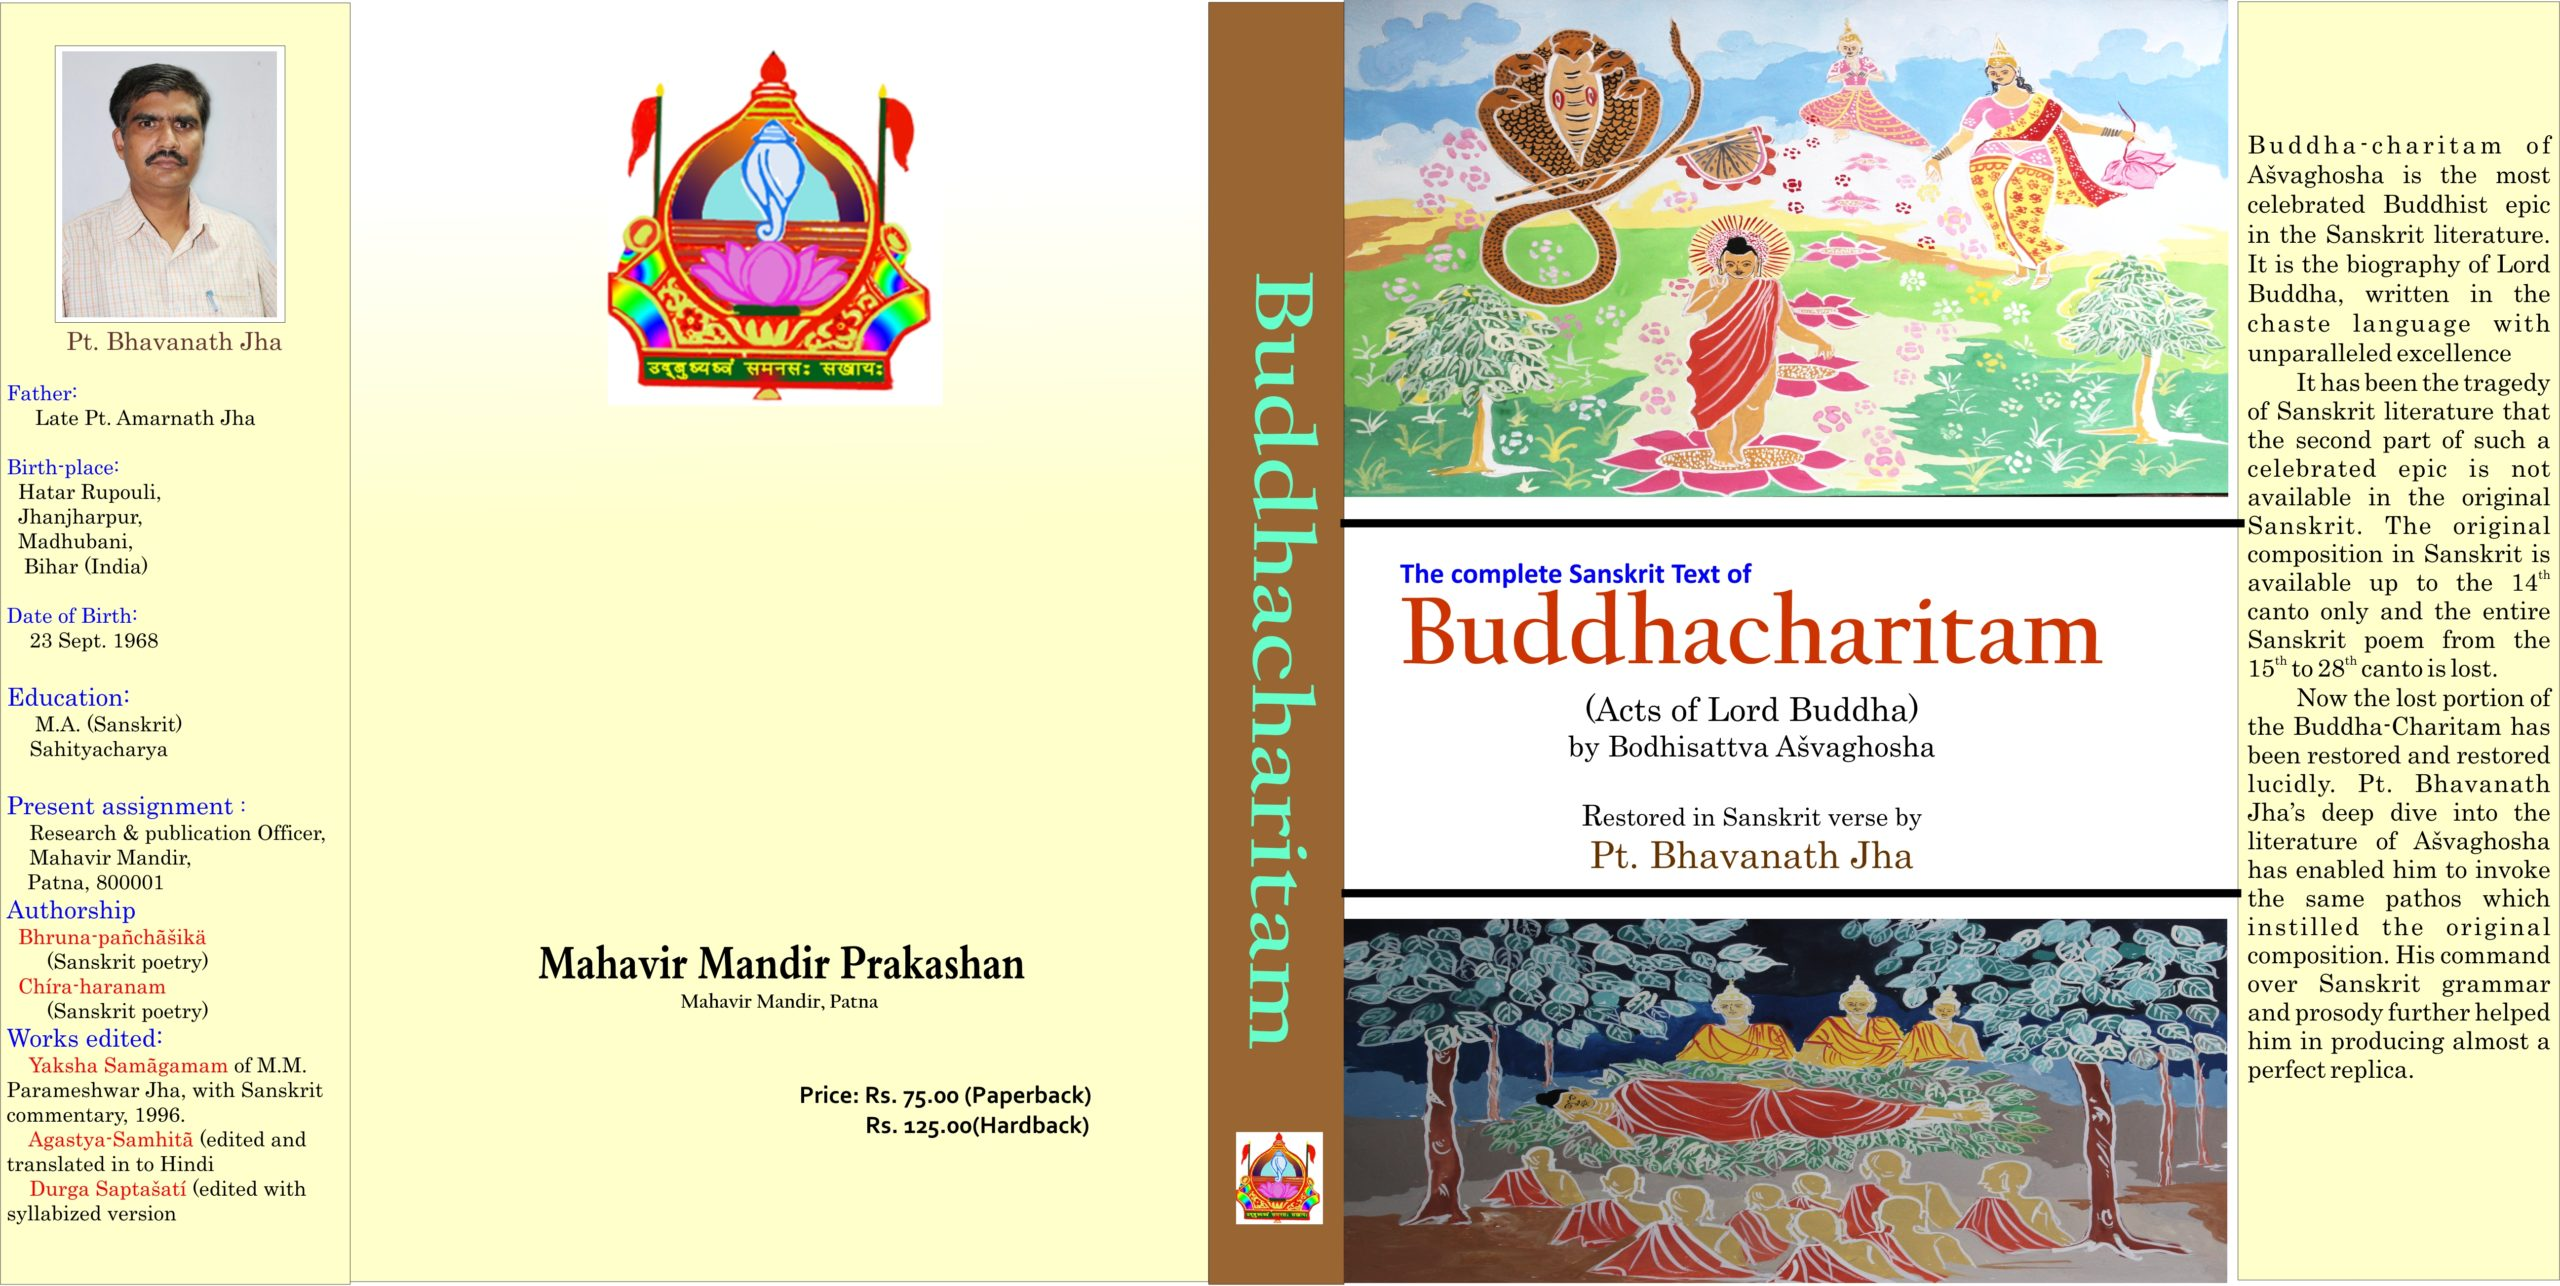 Buddhacharitam by Bhavanath Jha